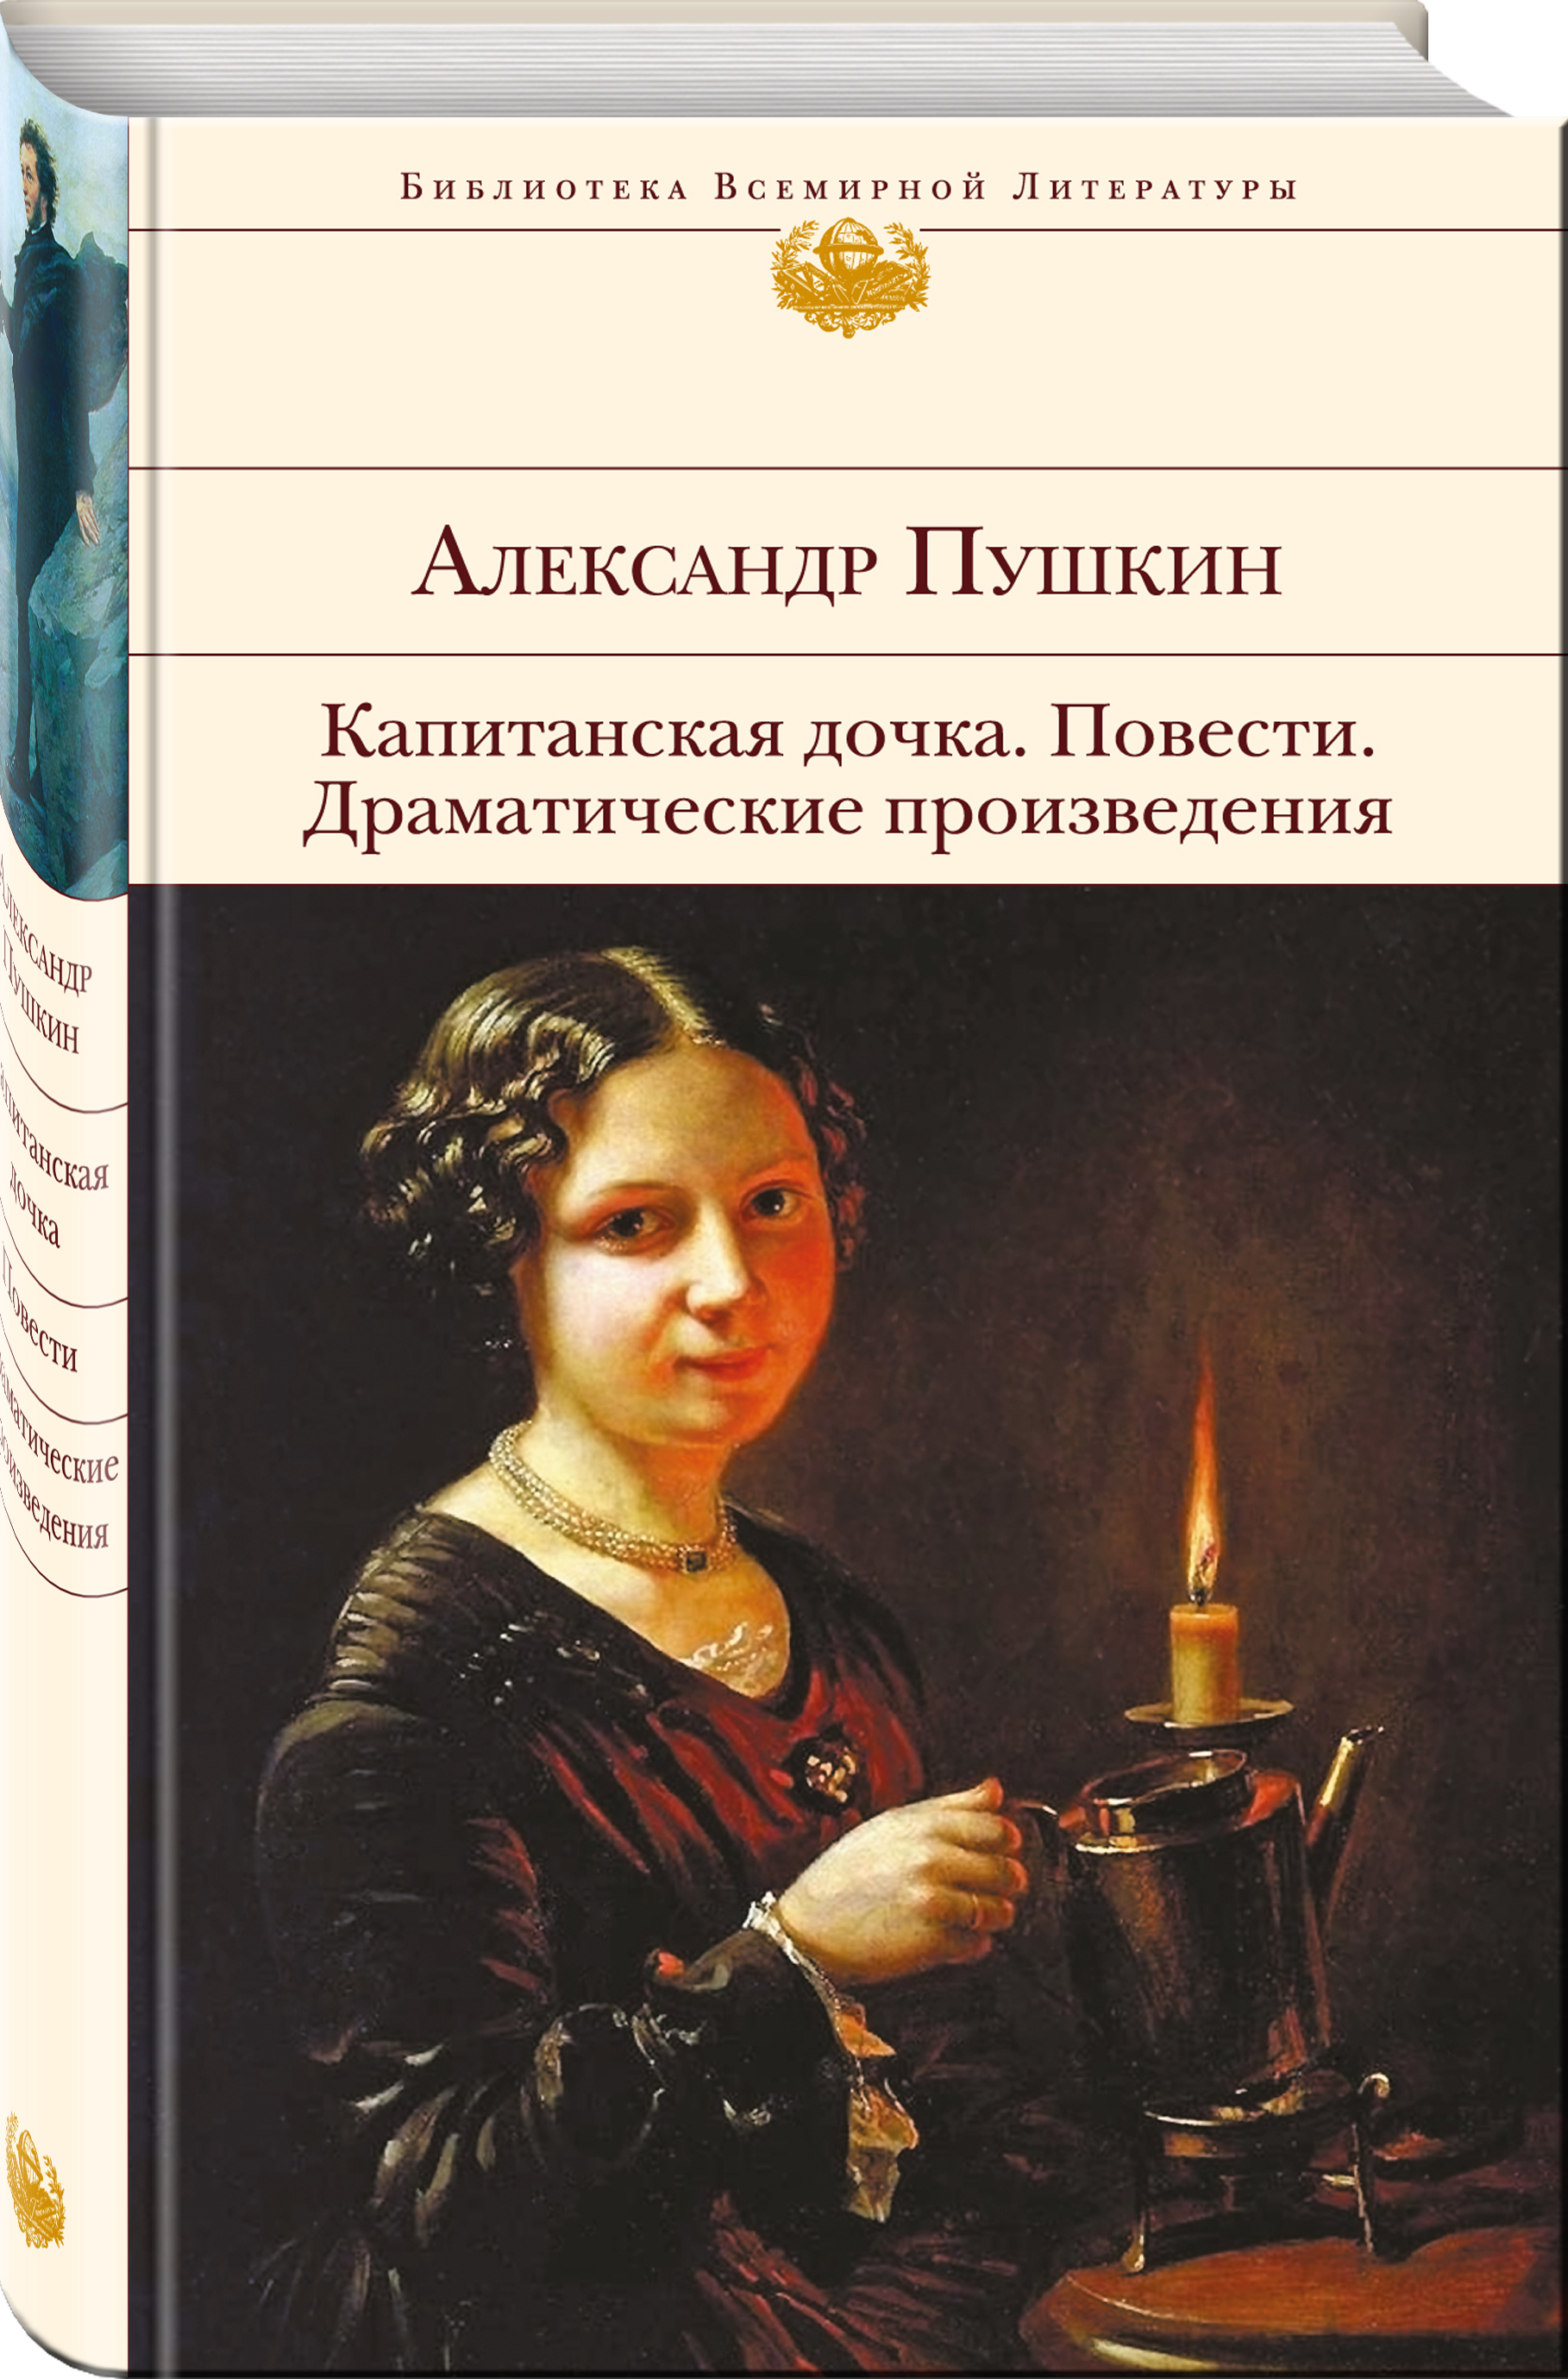 все цены на Александр Пушкин Капитанская дочка. Повести. Драматические произведения онлайн